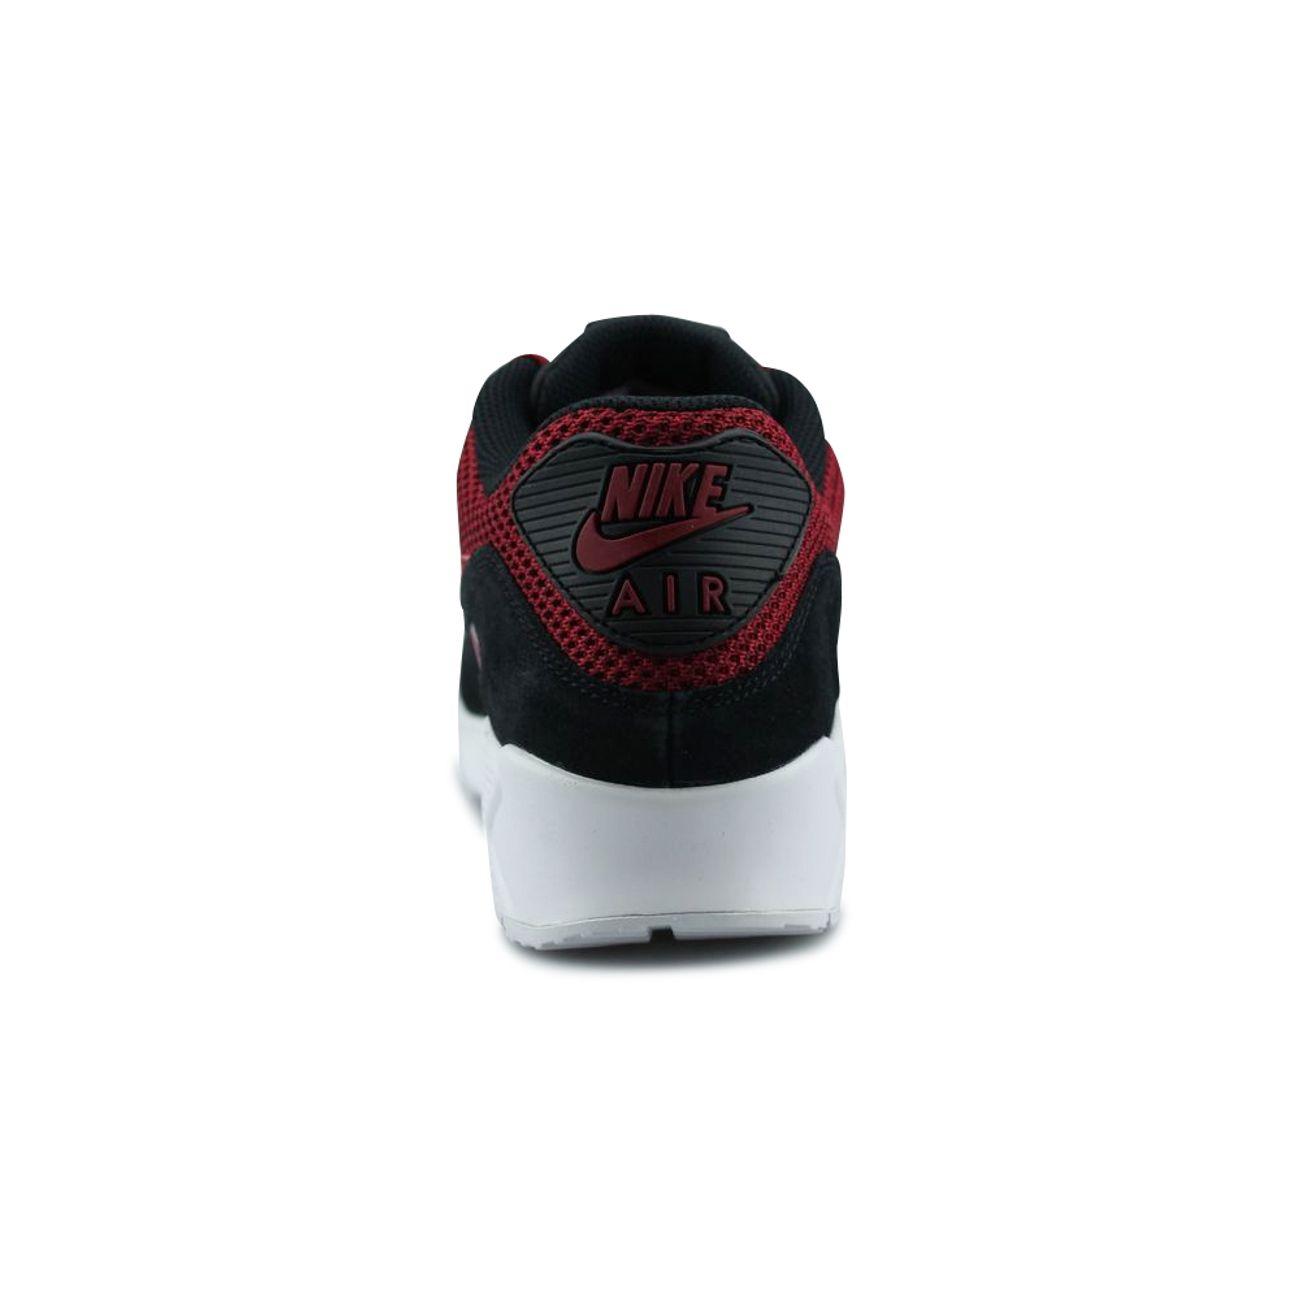 best cheap 68a0a 0d716 ... Mode- Lifestyle homme NIKE Basket Nike Air Max 90 Essential Noir 537384- 076